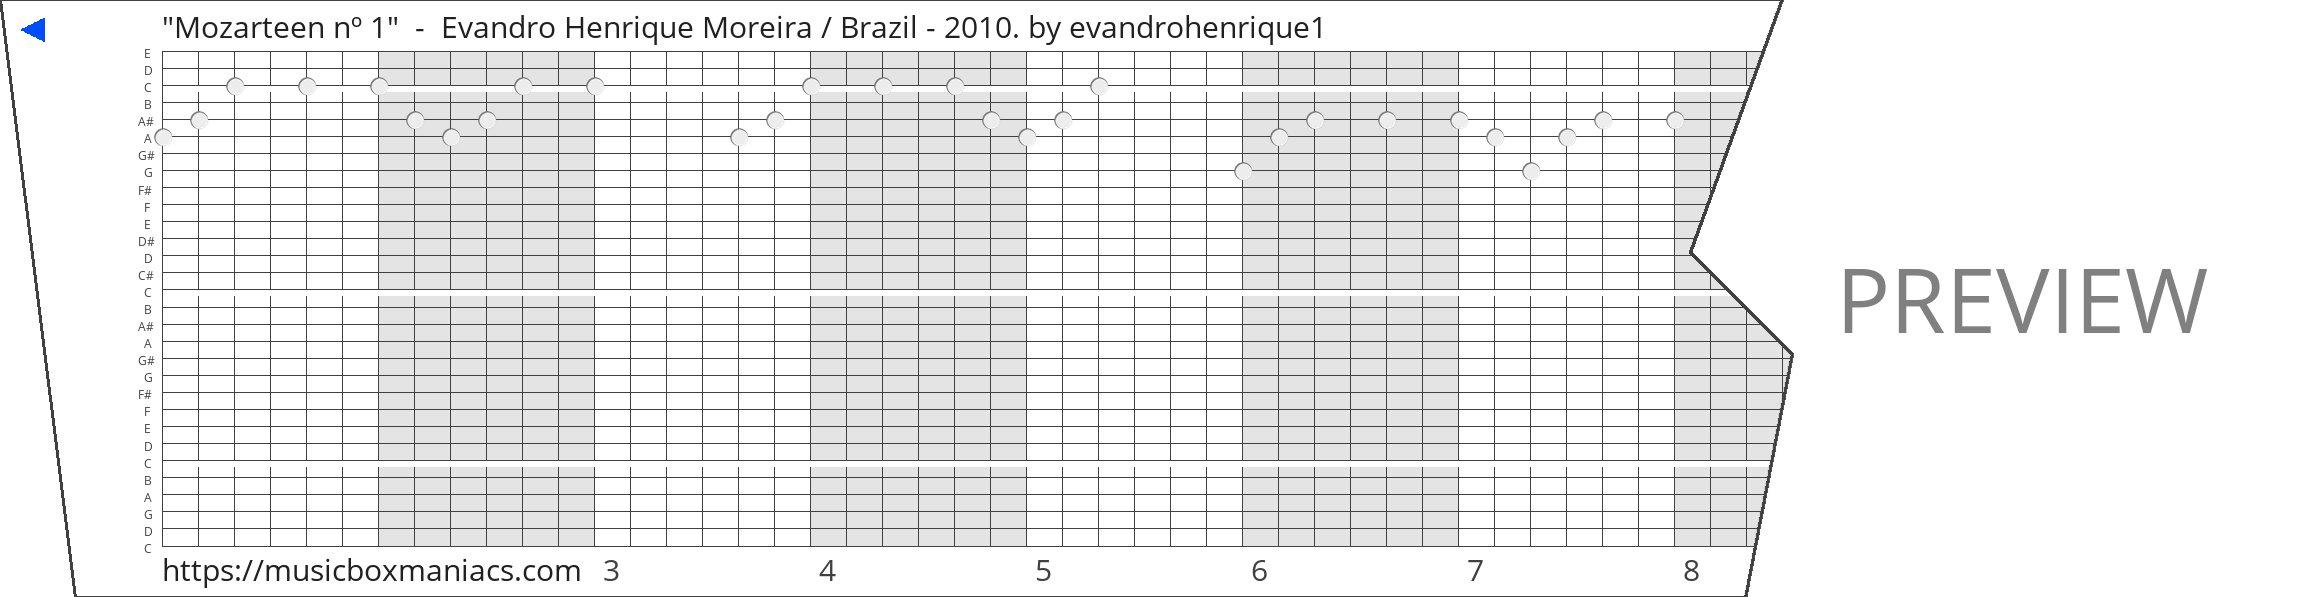 """Mozarteen nº 1""  -  Evandro Henrique Moreira / Brazil - 2010. 30 note music box paper strip"